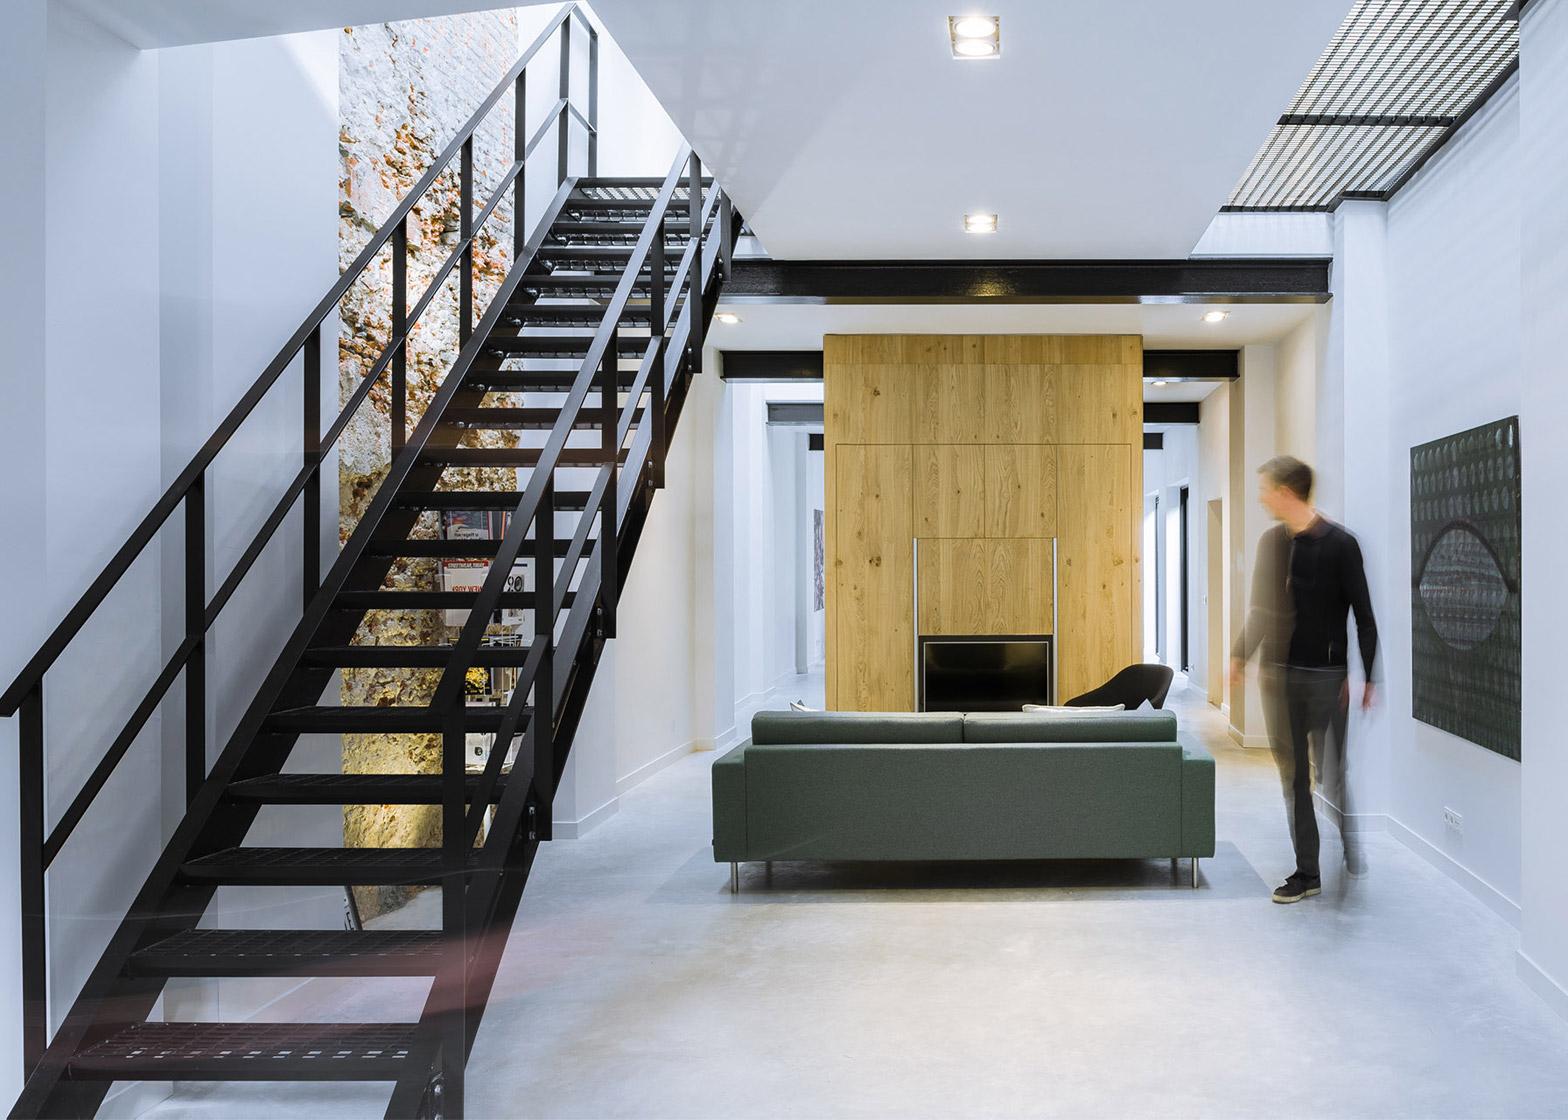 architecture_loft_design_studia_interiors_osnovadesign_osnova_poltava_03